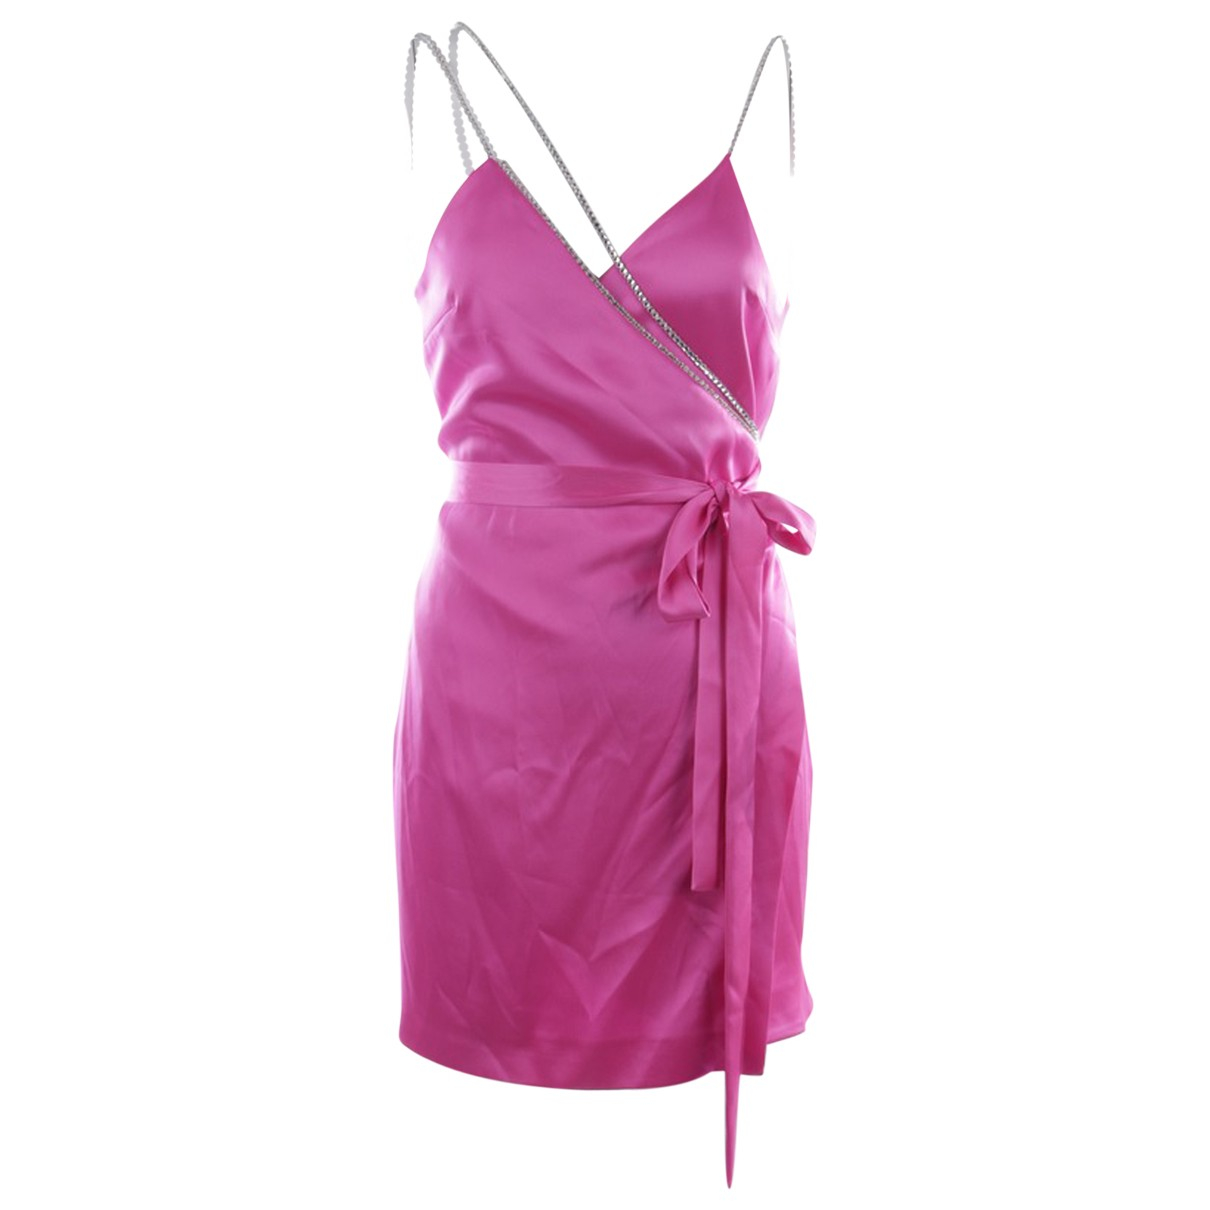 Vestido de Cuero David Koma